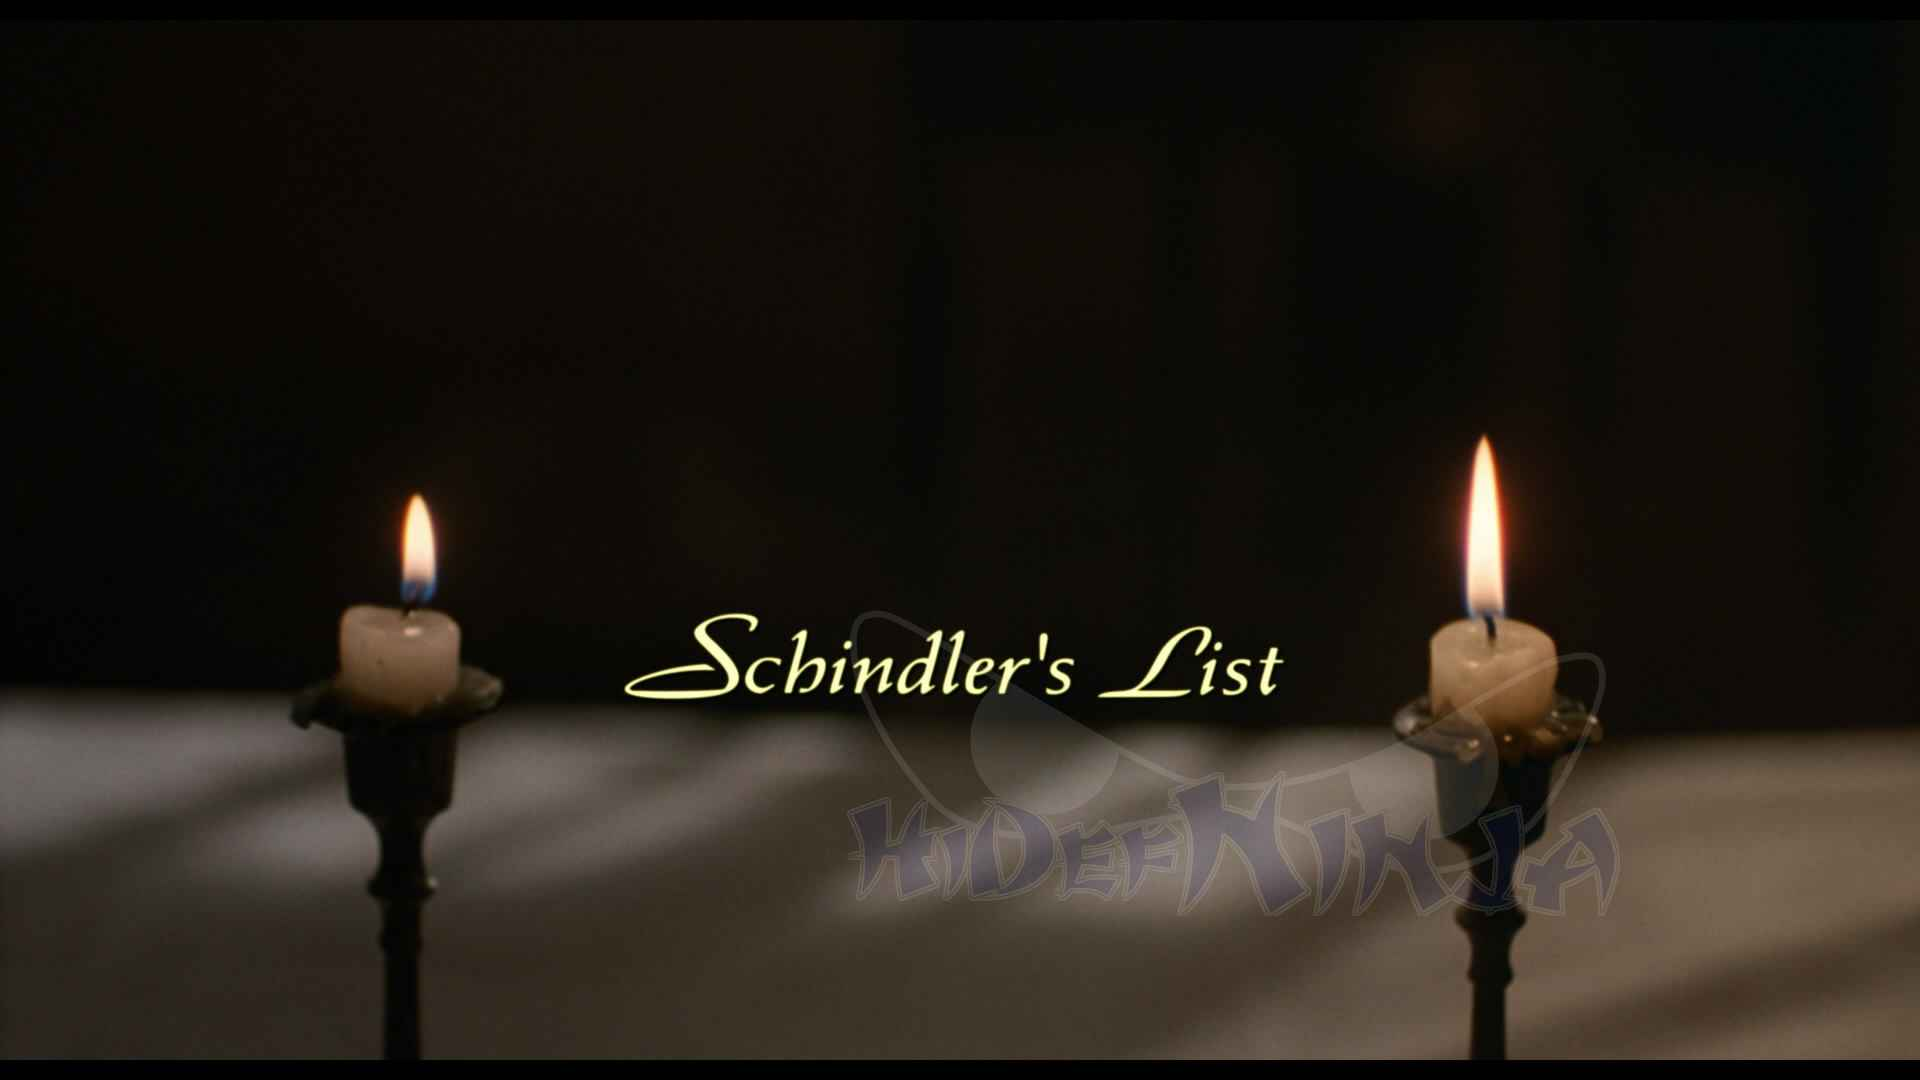 schindlers liste dvd